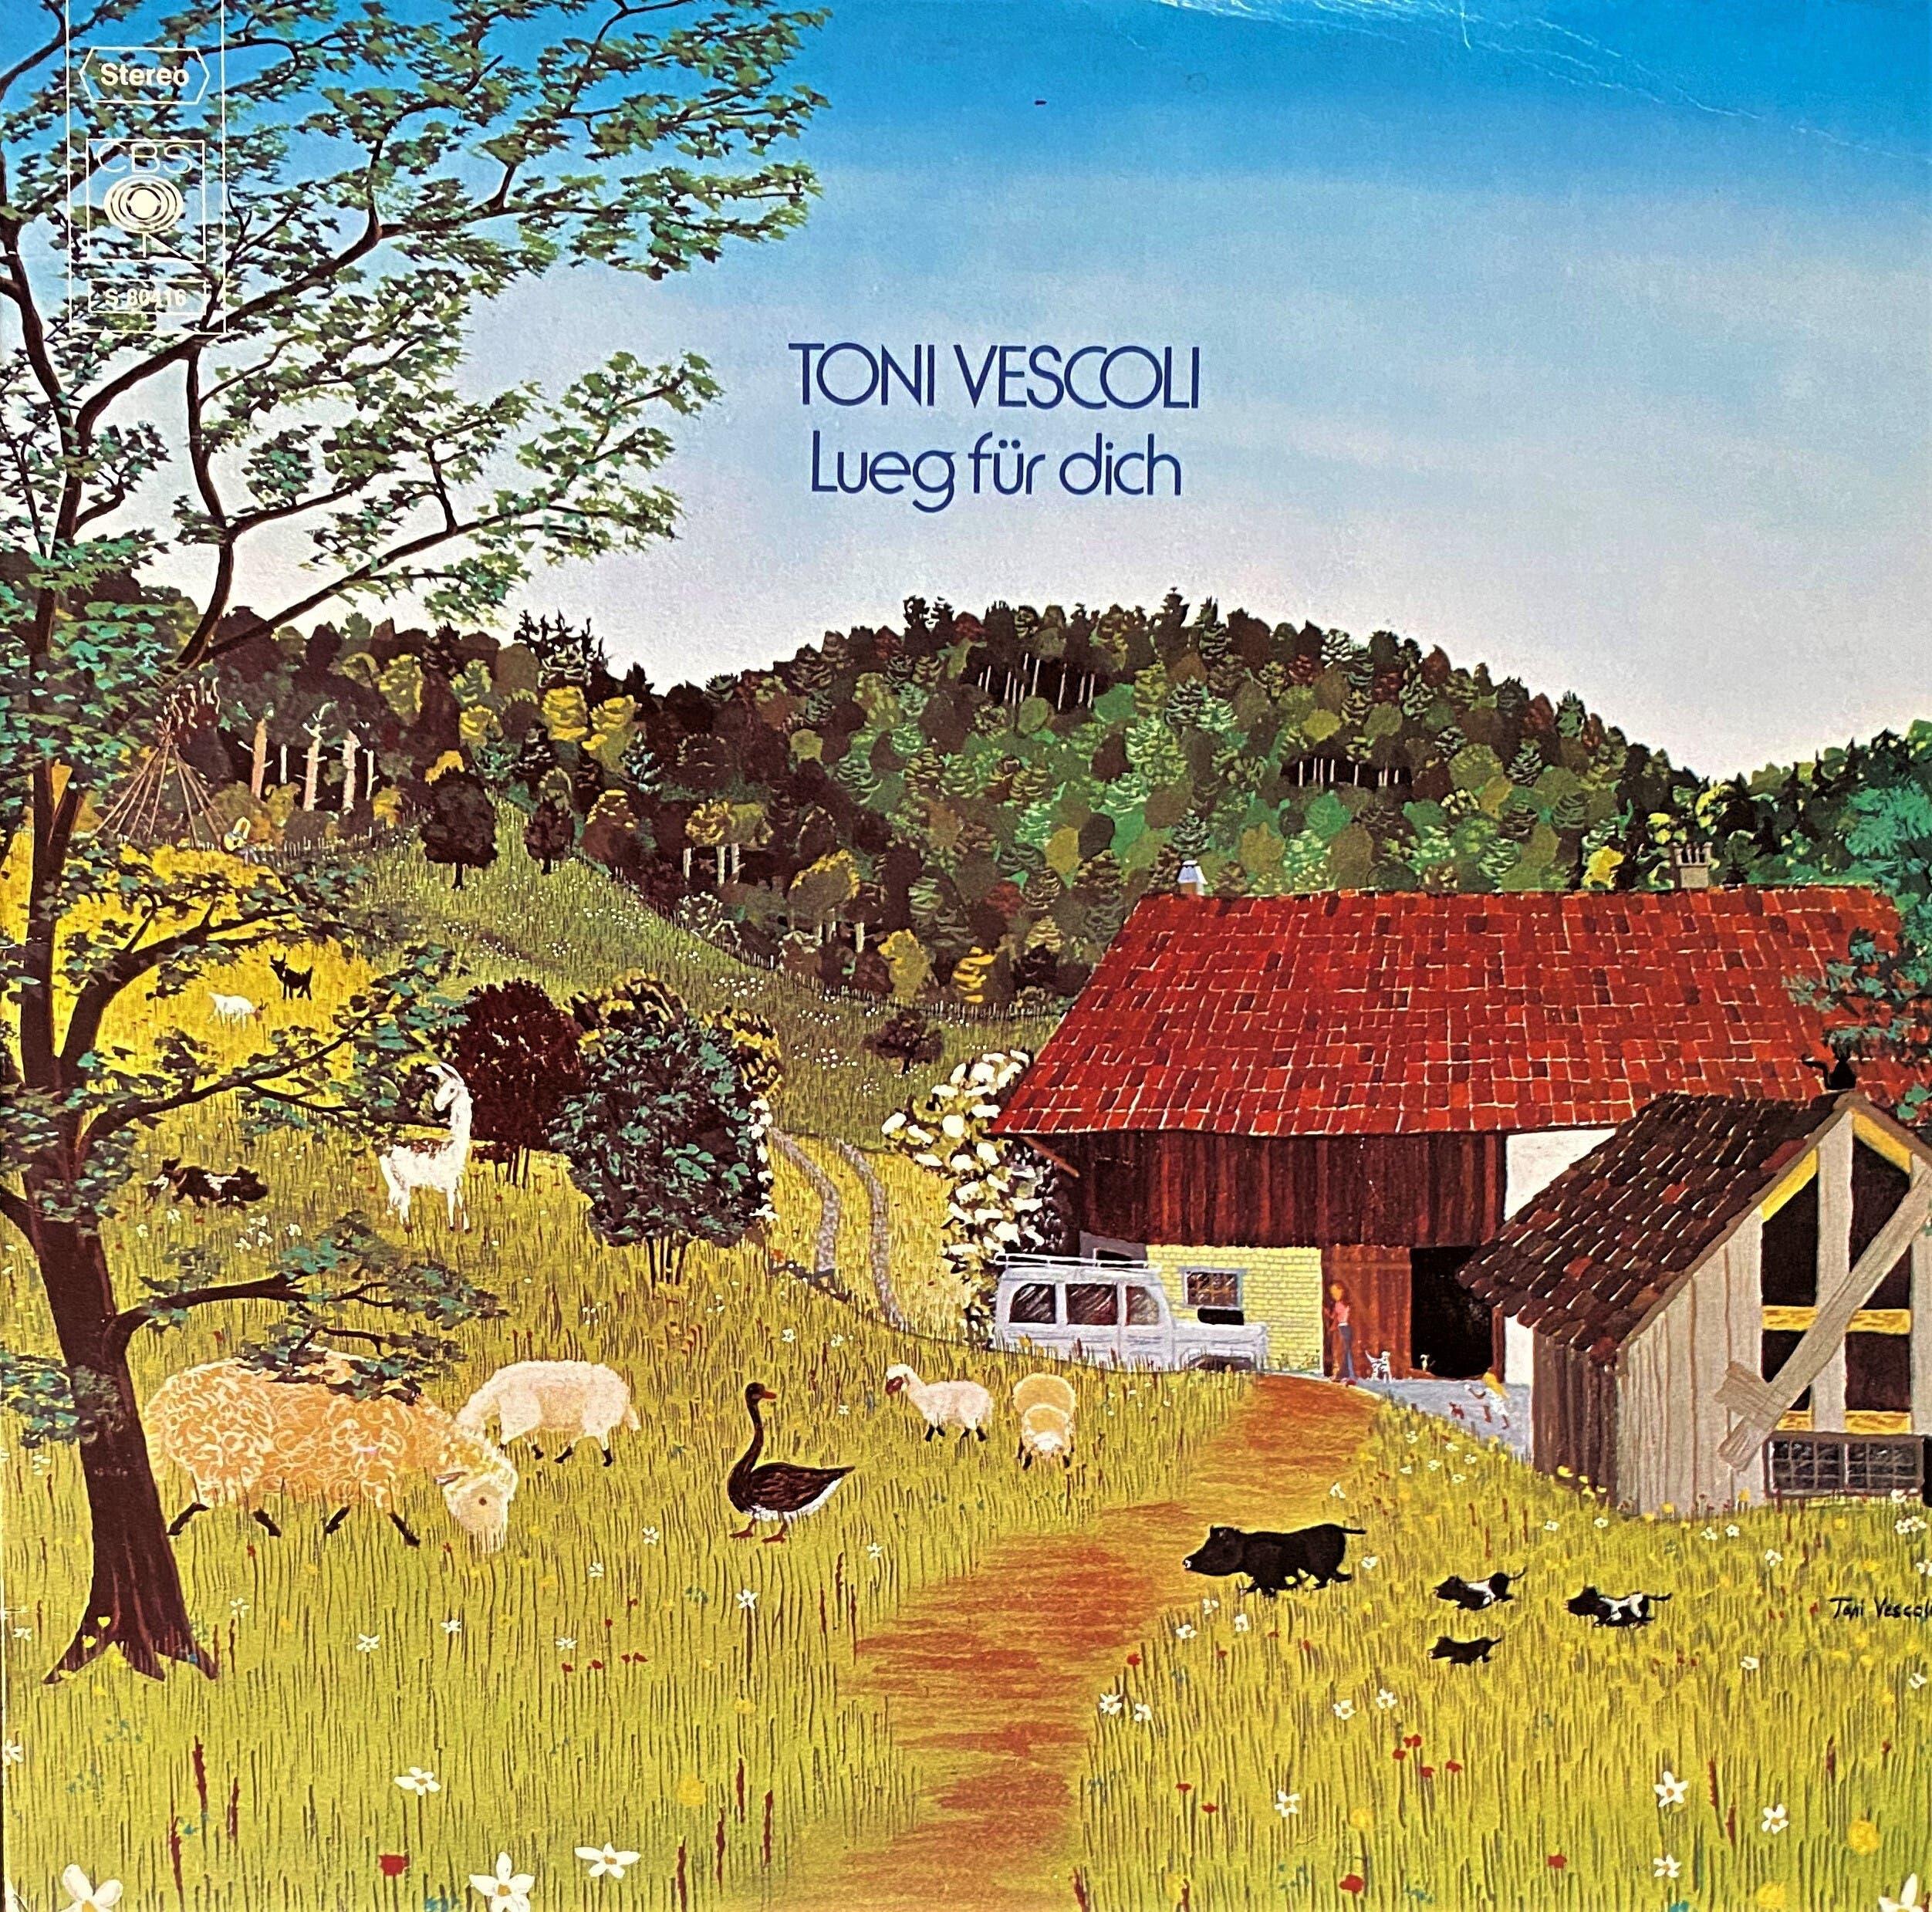 Toni Vescoli: Lueg für dich (Zürich 1974, Album)